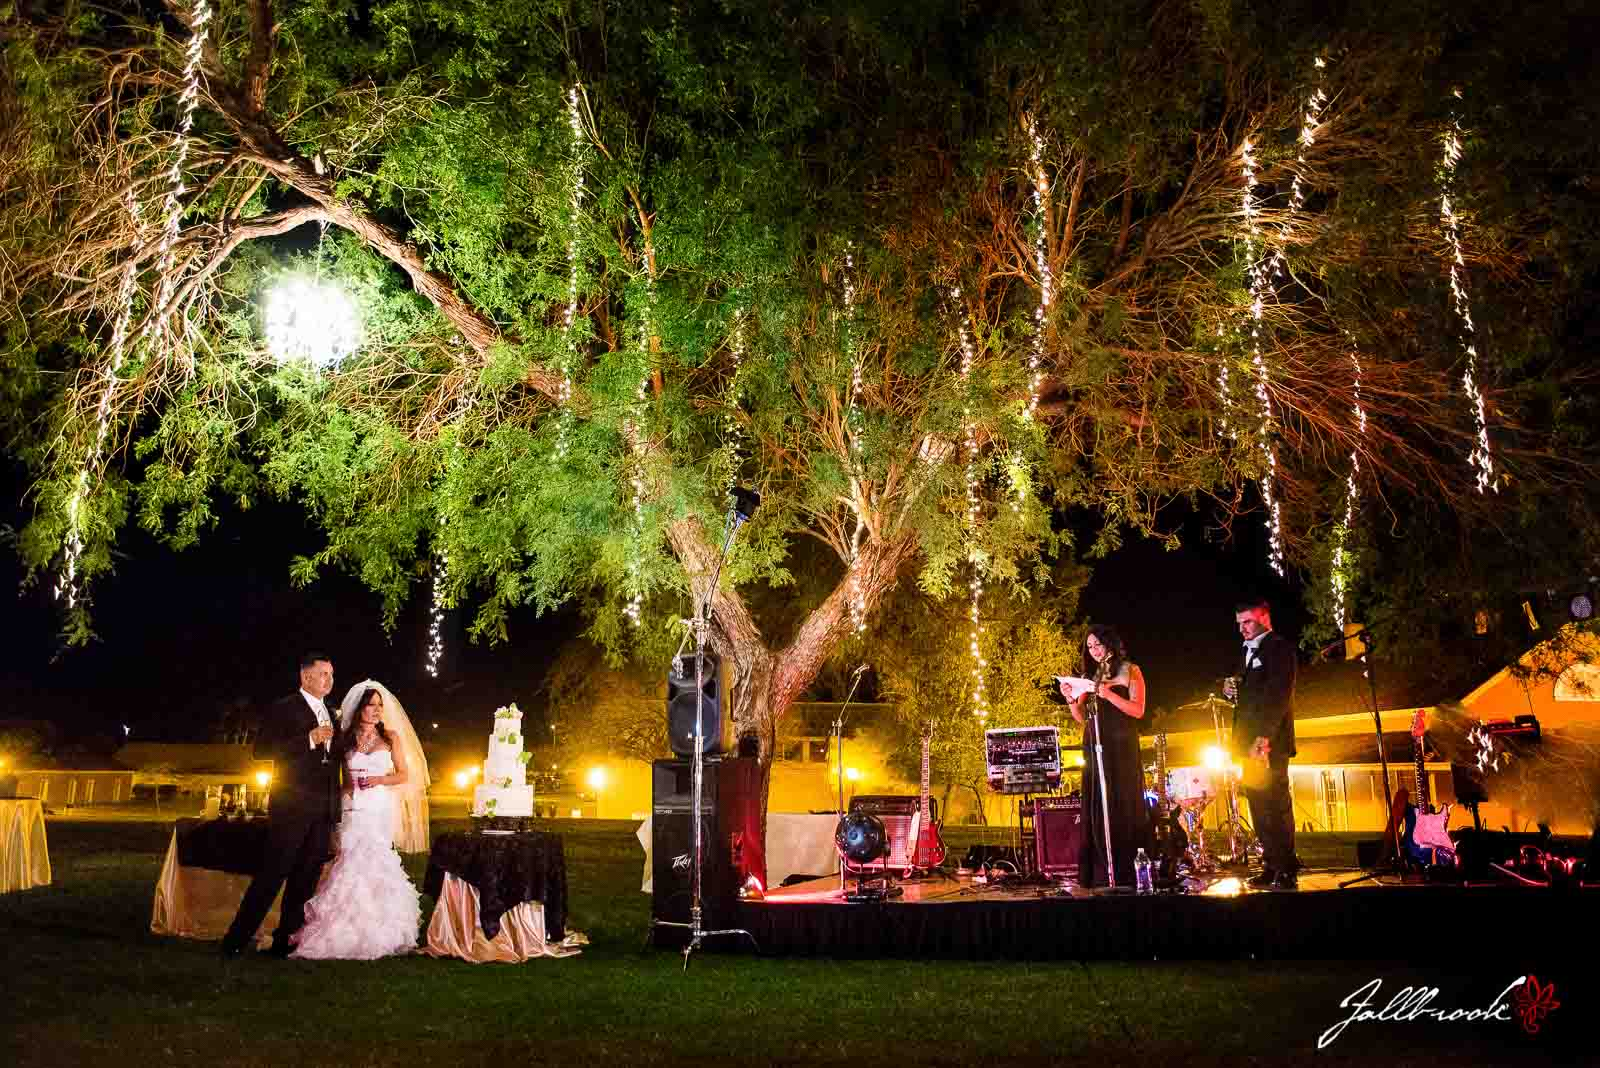 Quartermaster depot yuma weddings weddings from the quarter master depot in yuma arizona junglespirit Gallery